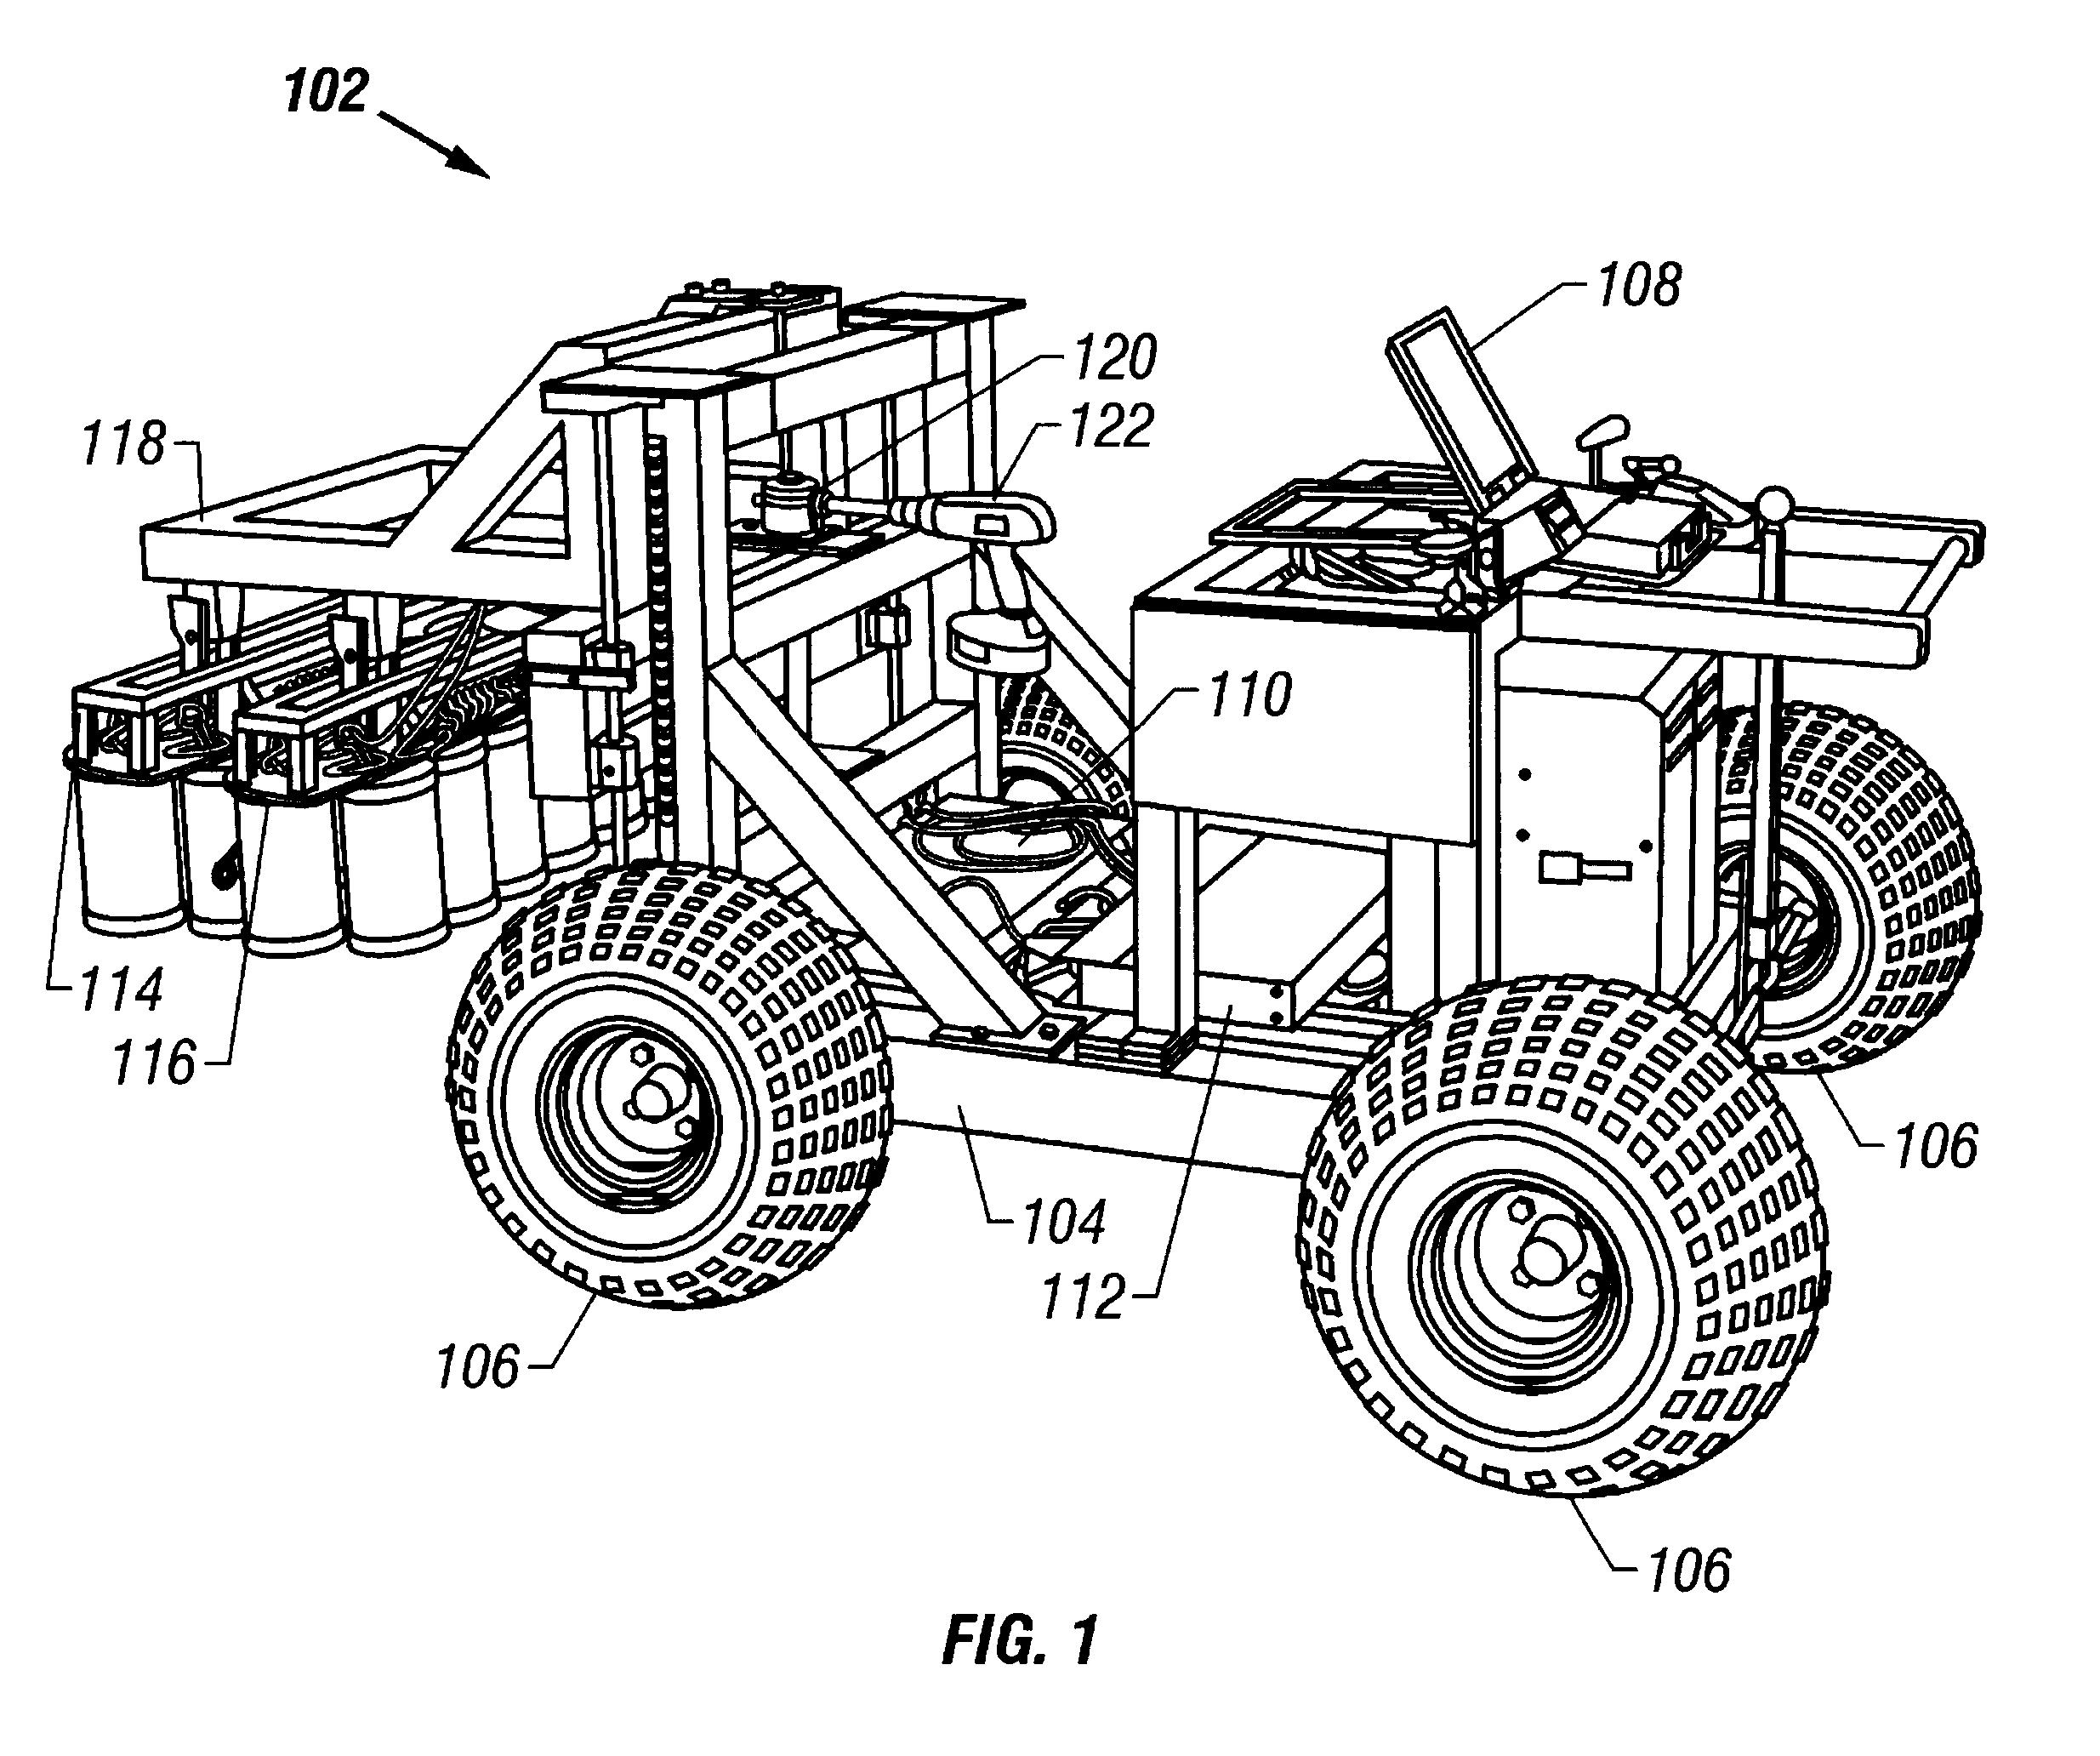 US6445334B1 - Ground penetrating radar system - Google Patents